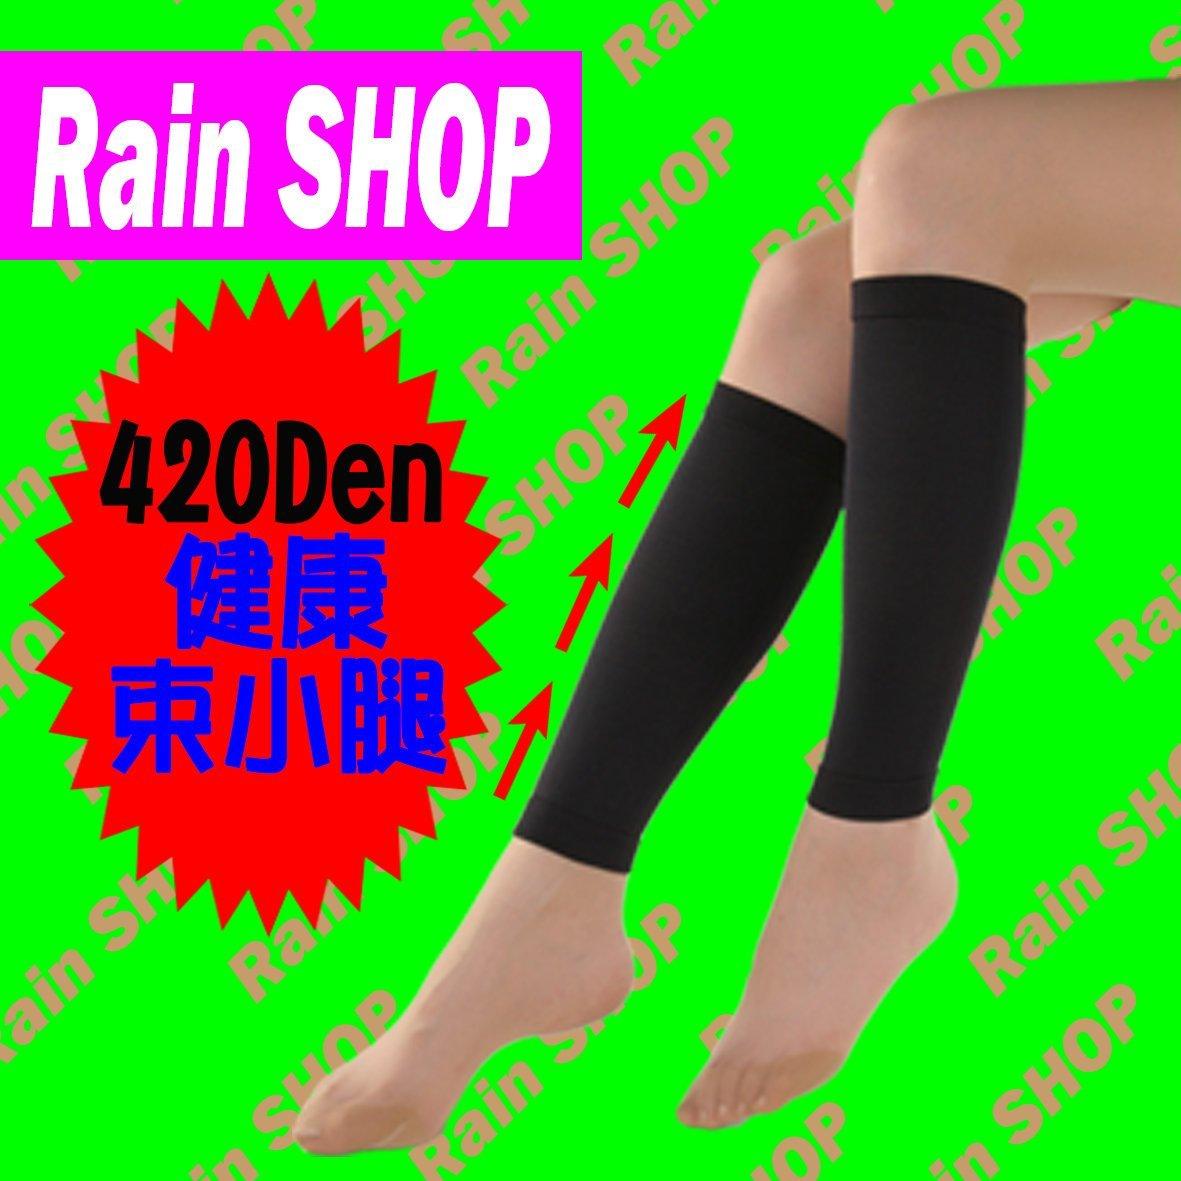 Rain SHOP健康襪館*正品Rain-420丹尼束小腿.馬拉松 壓縮腿套 束腿套 健康襪 壓力襪 萊卡 現貨台灣製